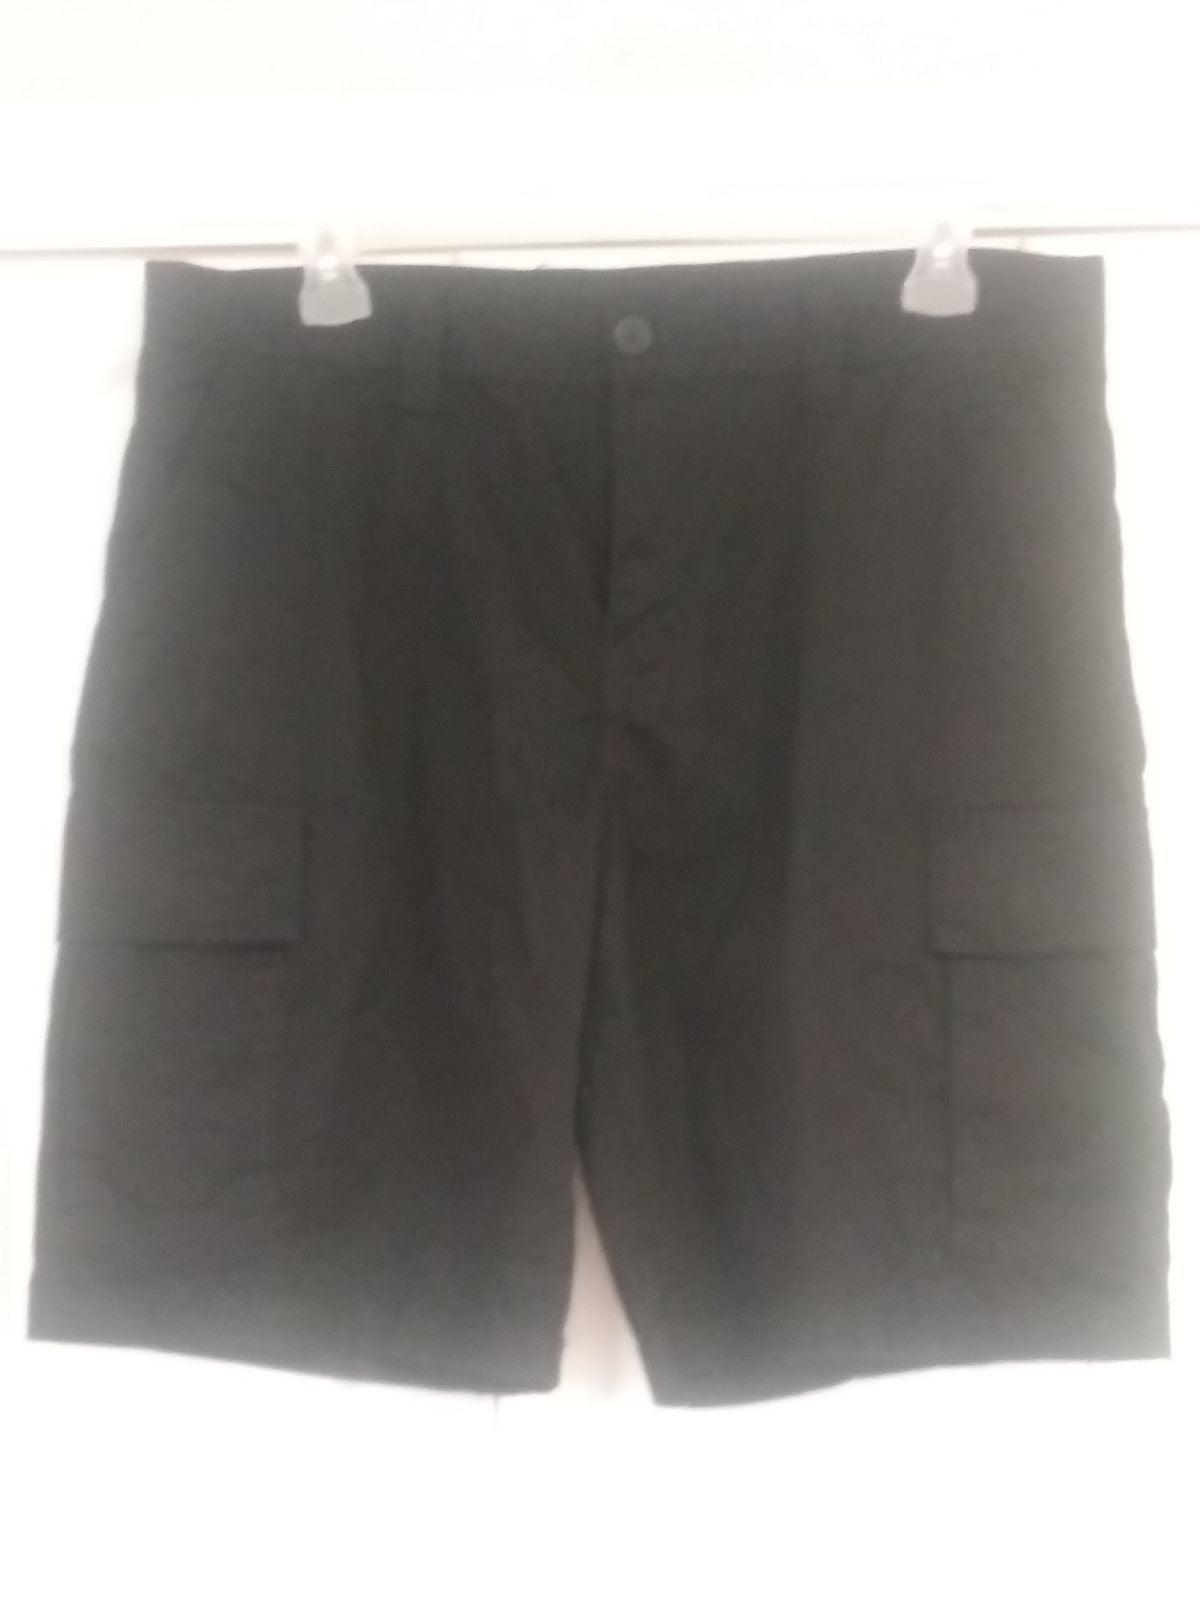 New Mens 38 Black Cargo Shorts